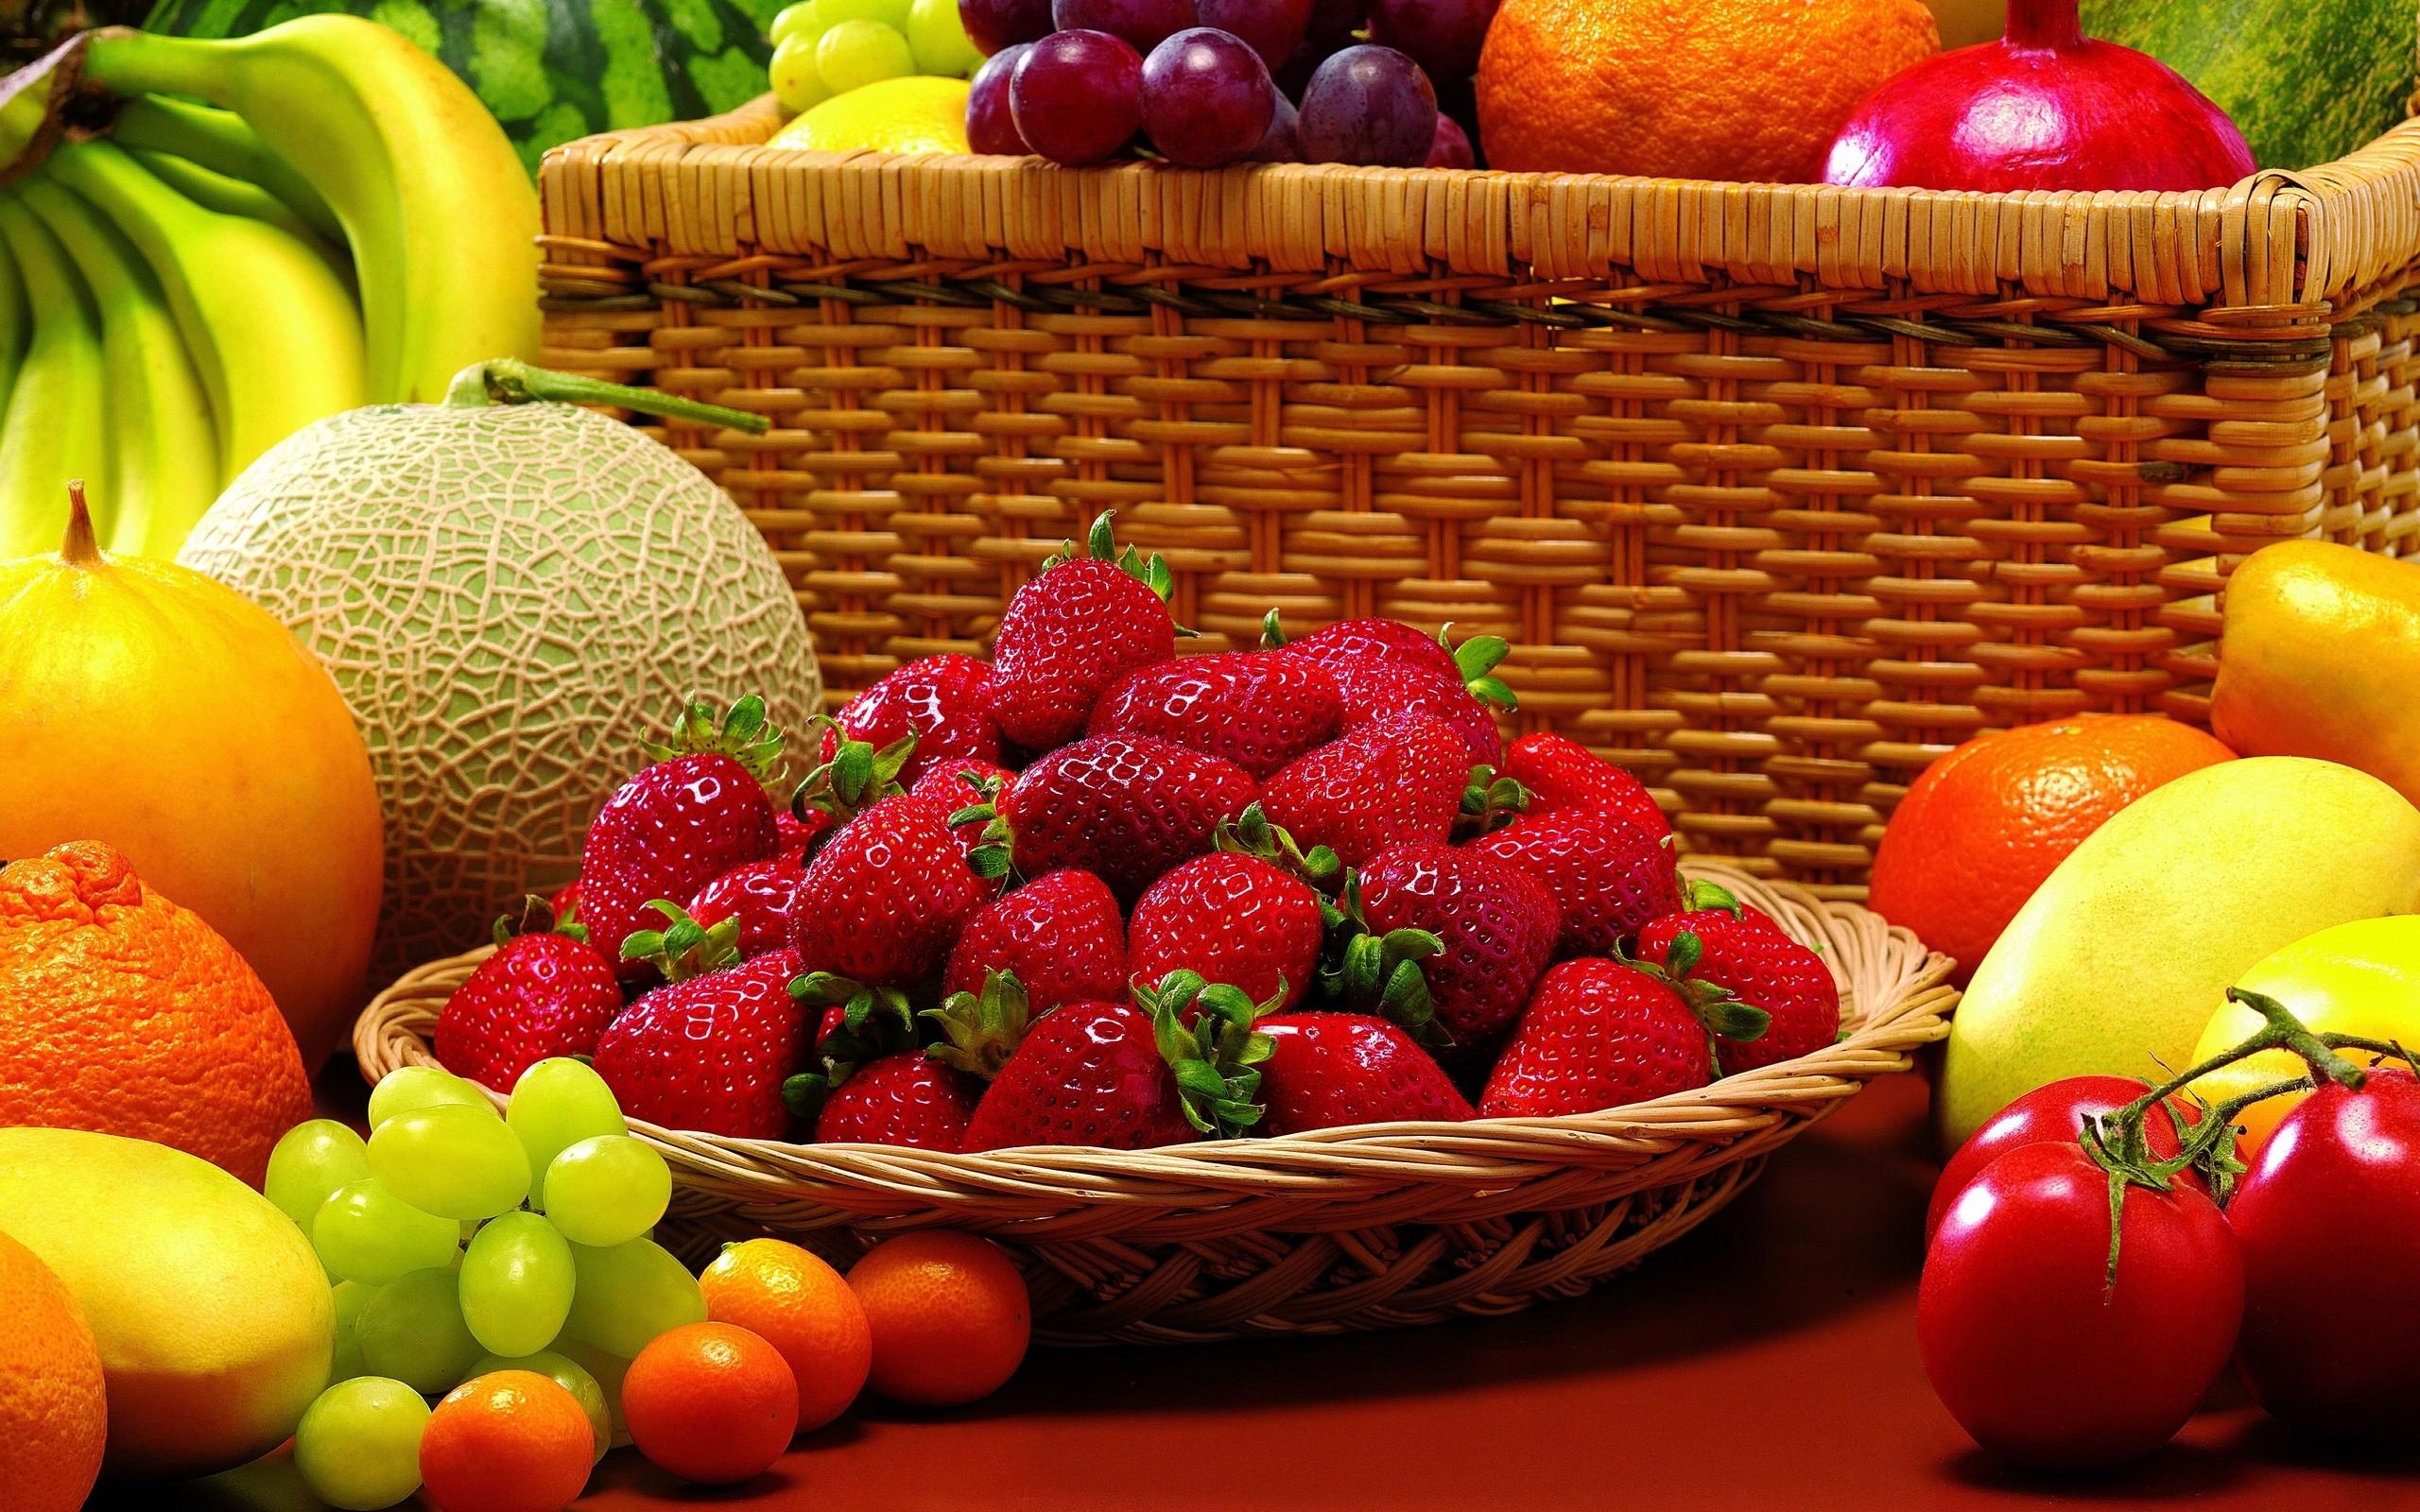 2560x1600 Strawberry Fruit Background Wallpaper For Desktop Mobile